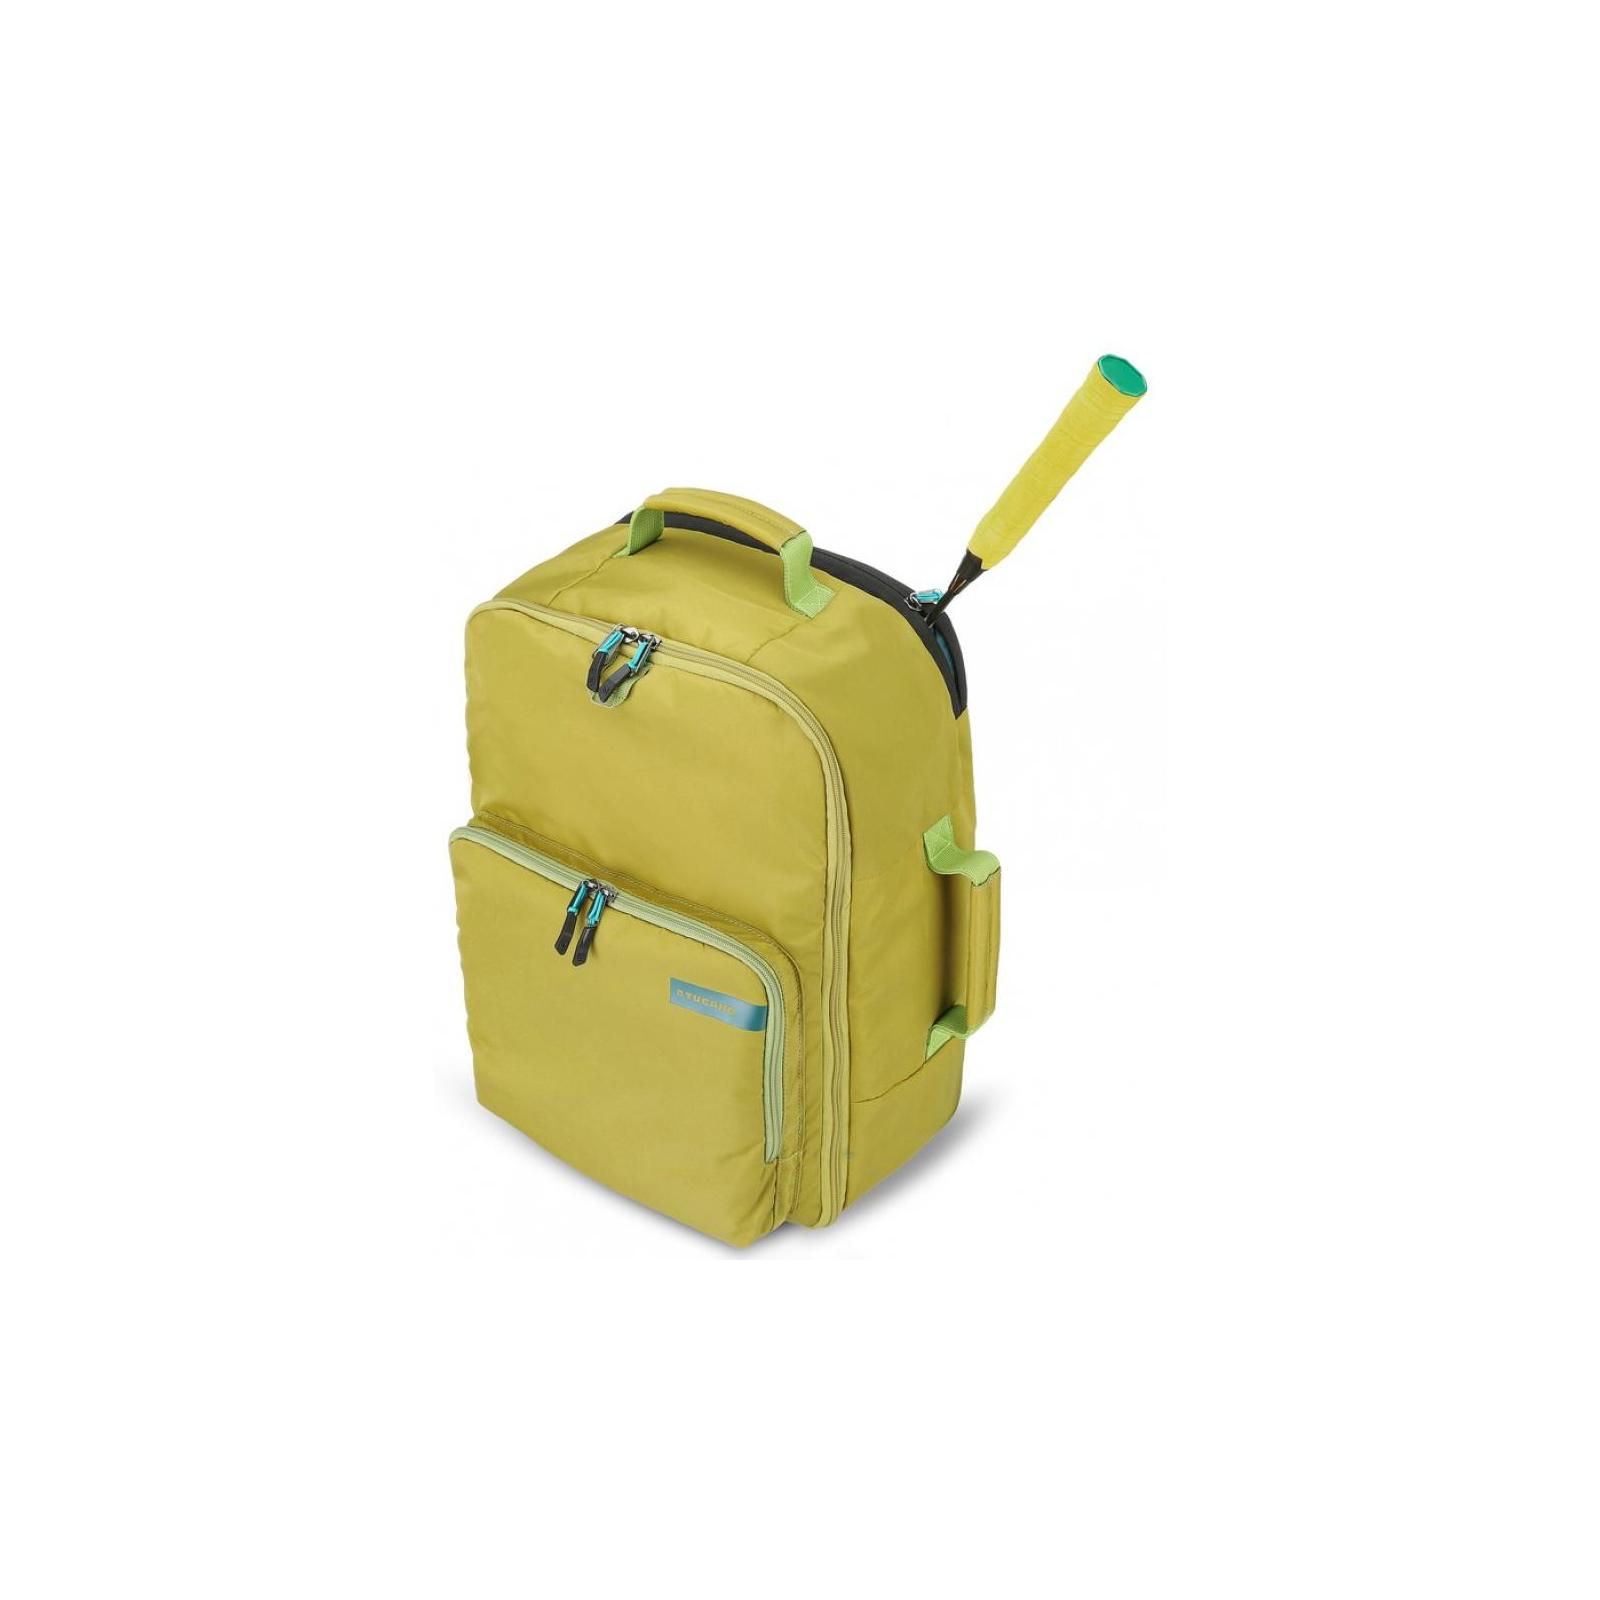 Рюкзак Tucano Sport Mister зелёный (BKMR-V) изображение 5